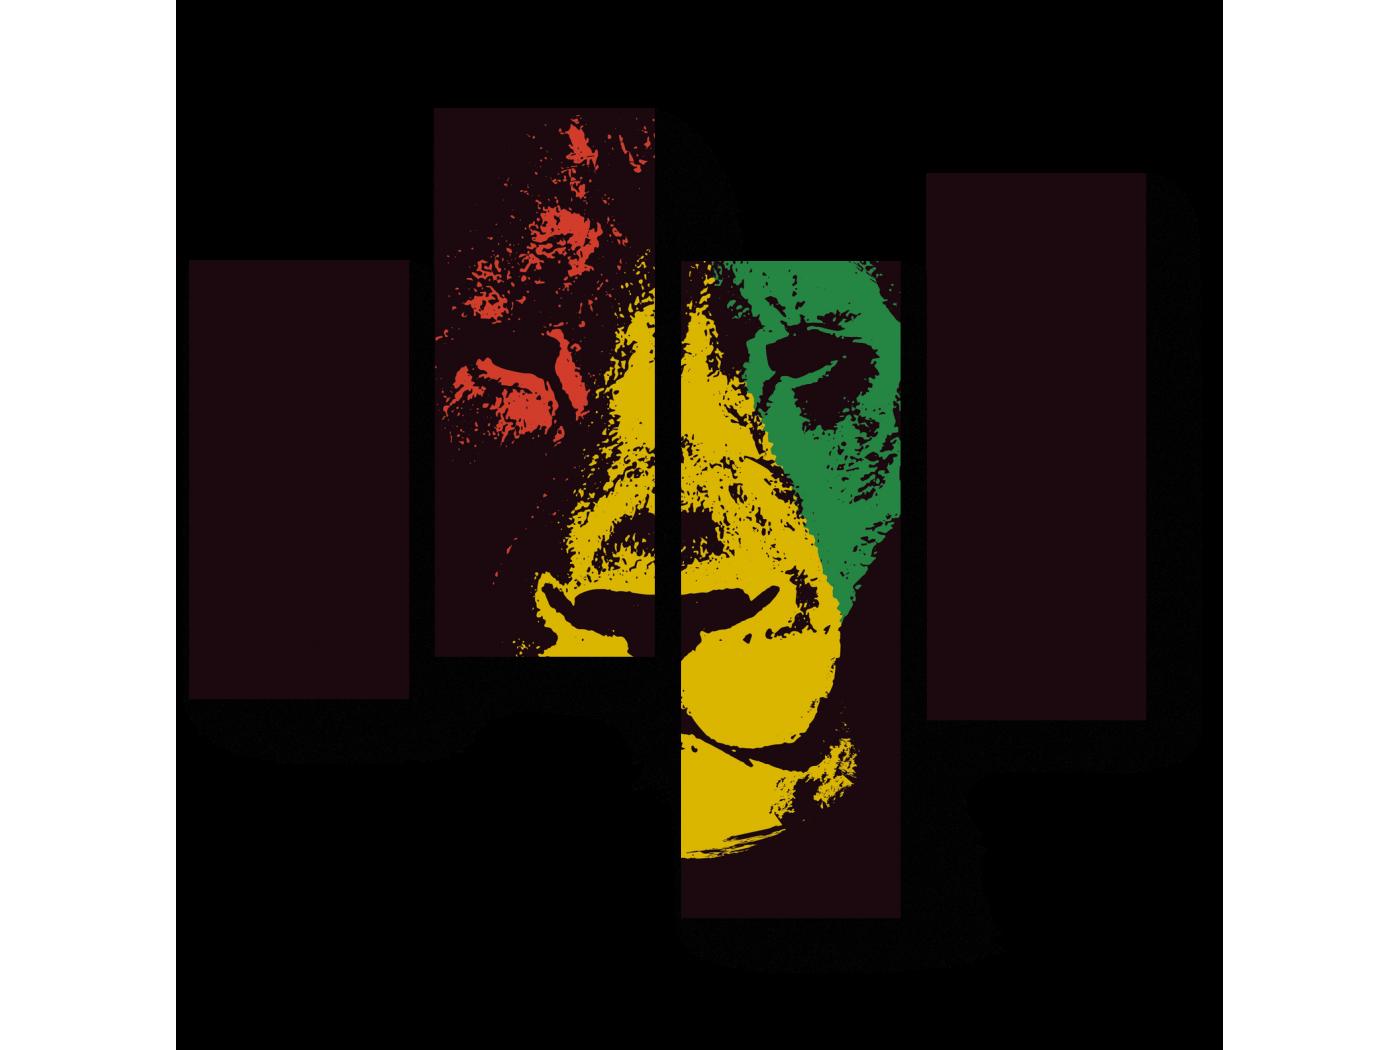 Модульная картина Африканский лев (64x60) фото